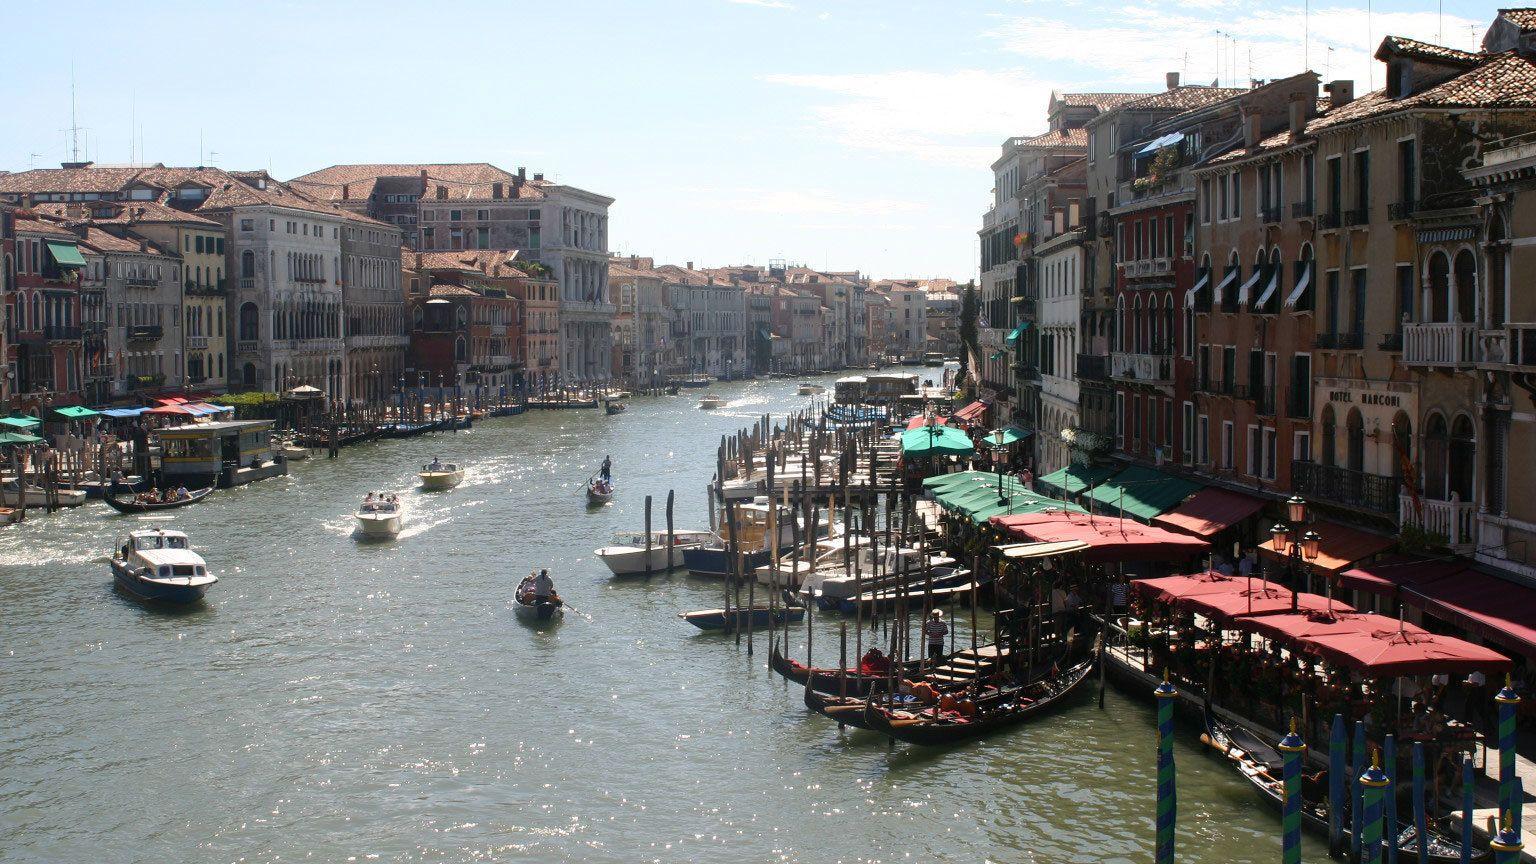 navigating the waterways in Venice